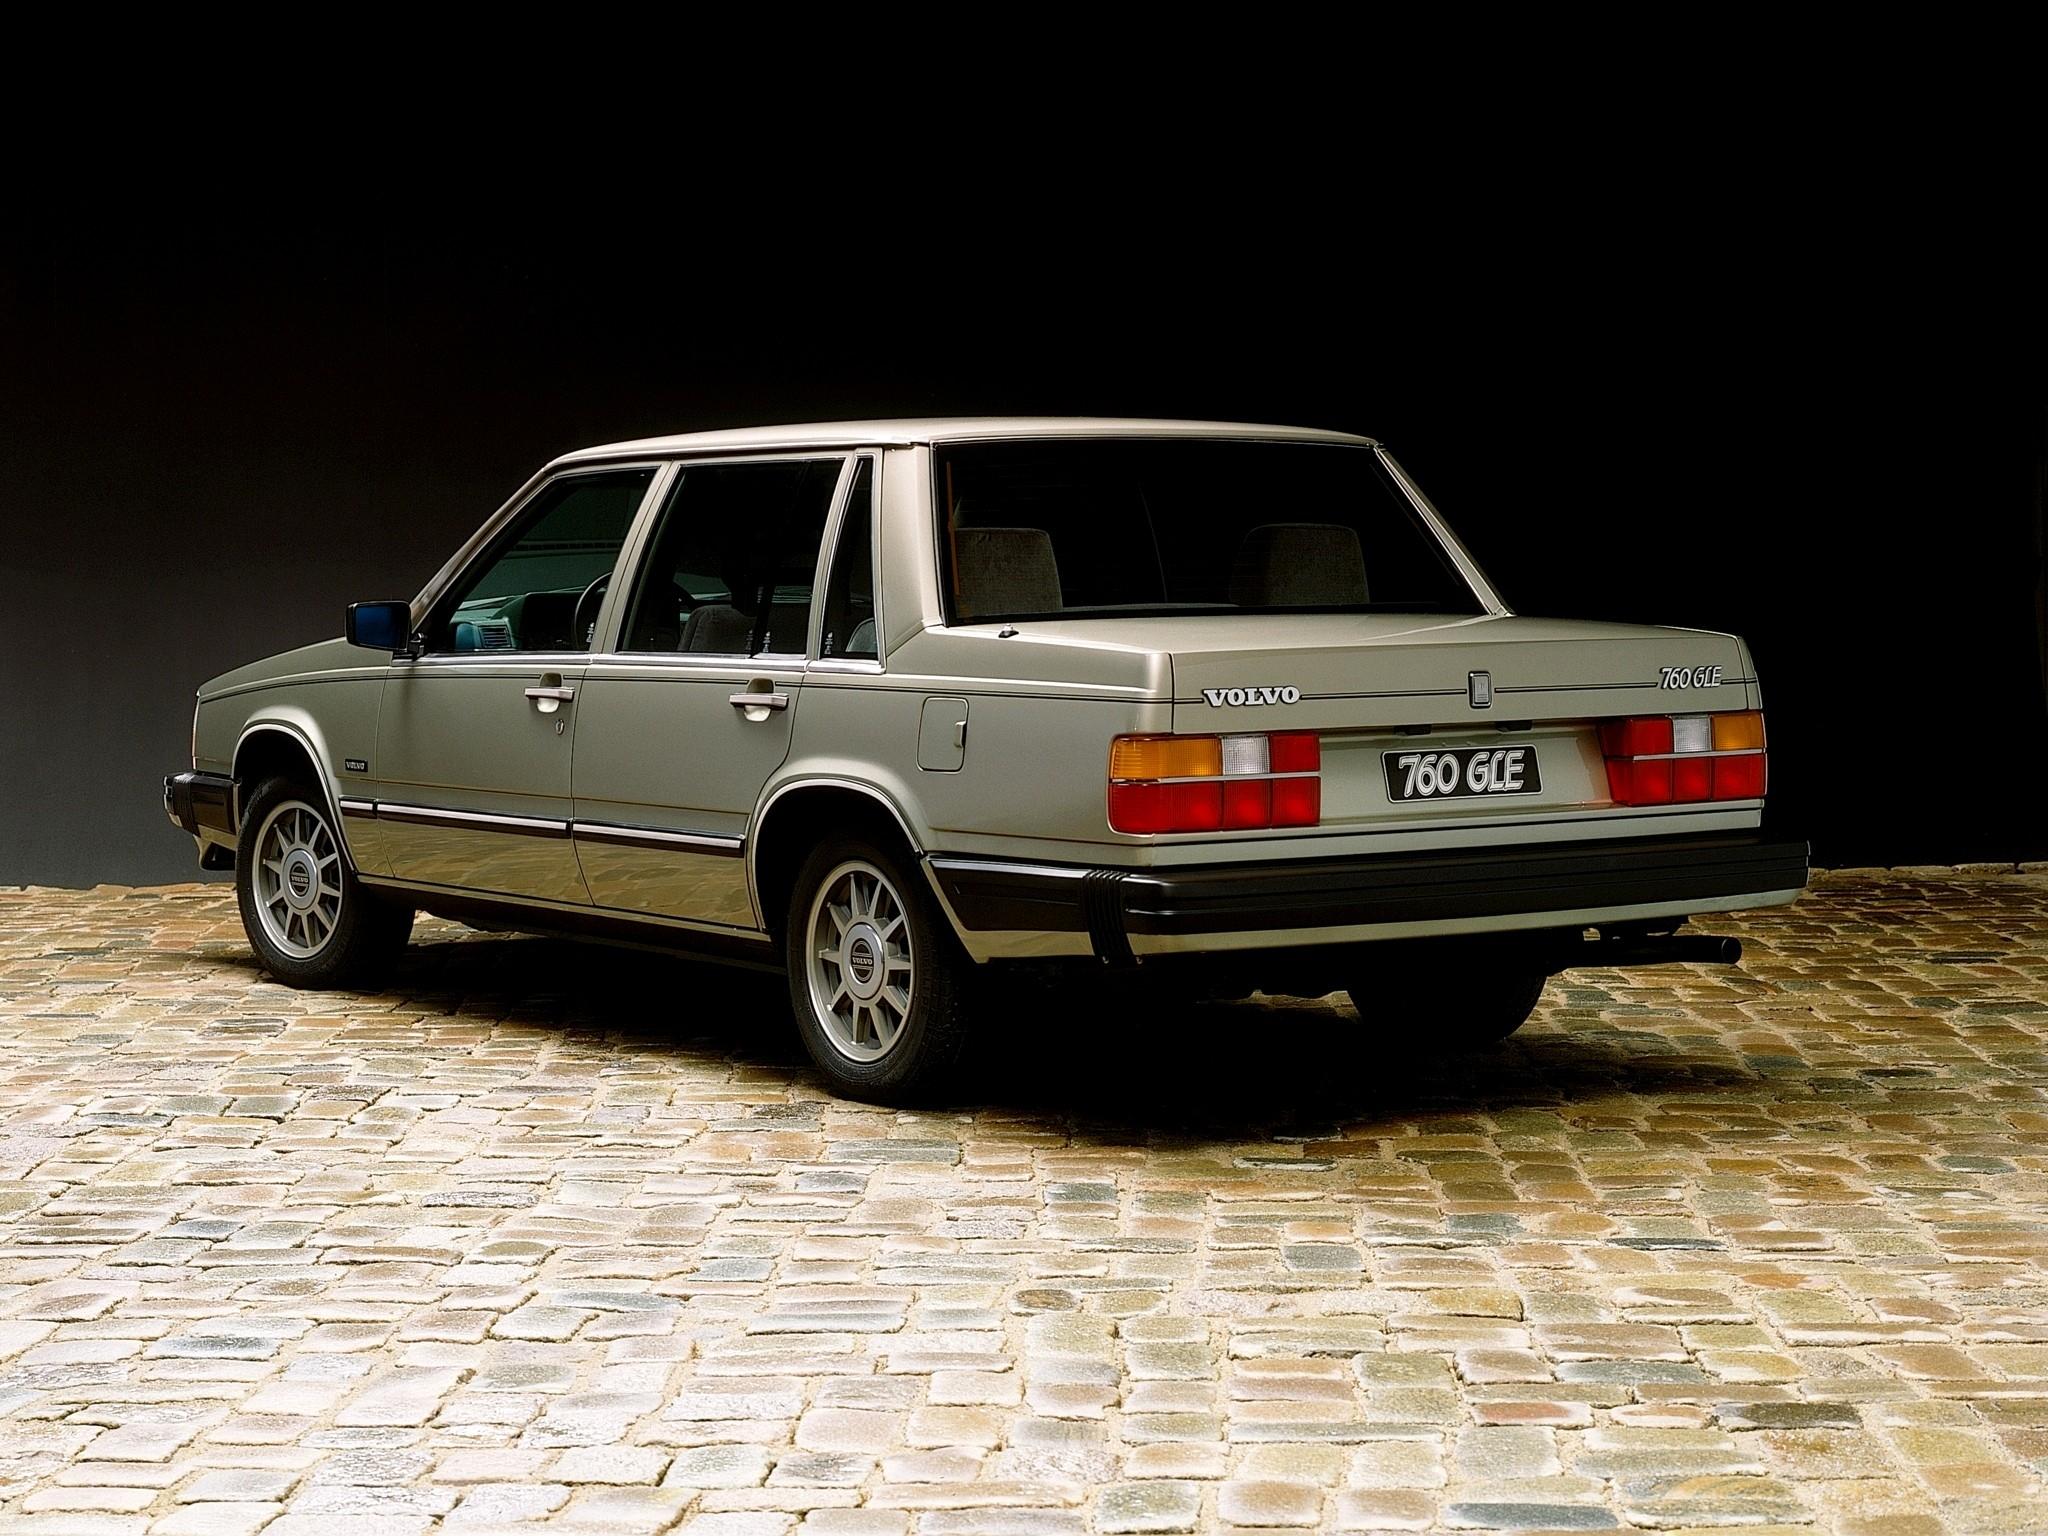 VOLVO 760 - 1982, 1983, 1984, 1985, 1986, 1987, 1988, 1989, 1990 - autoevolution